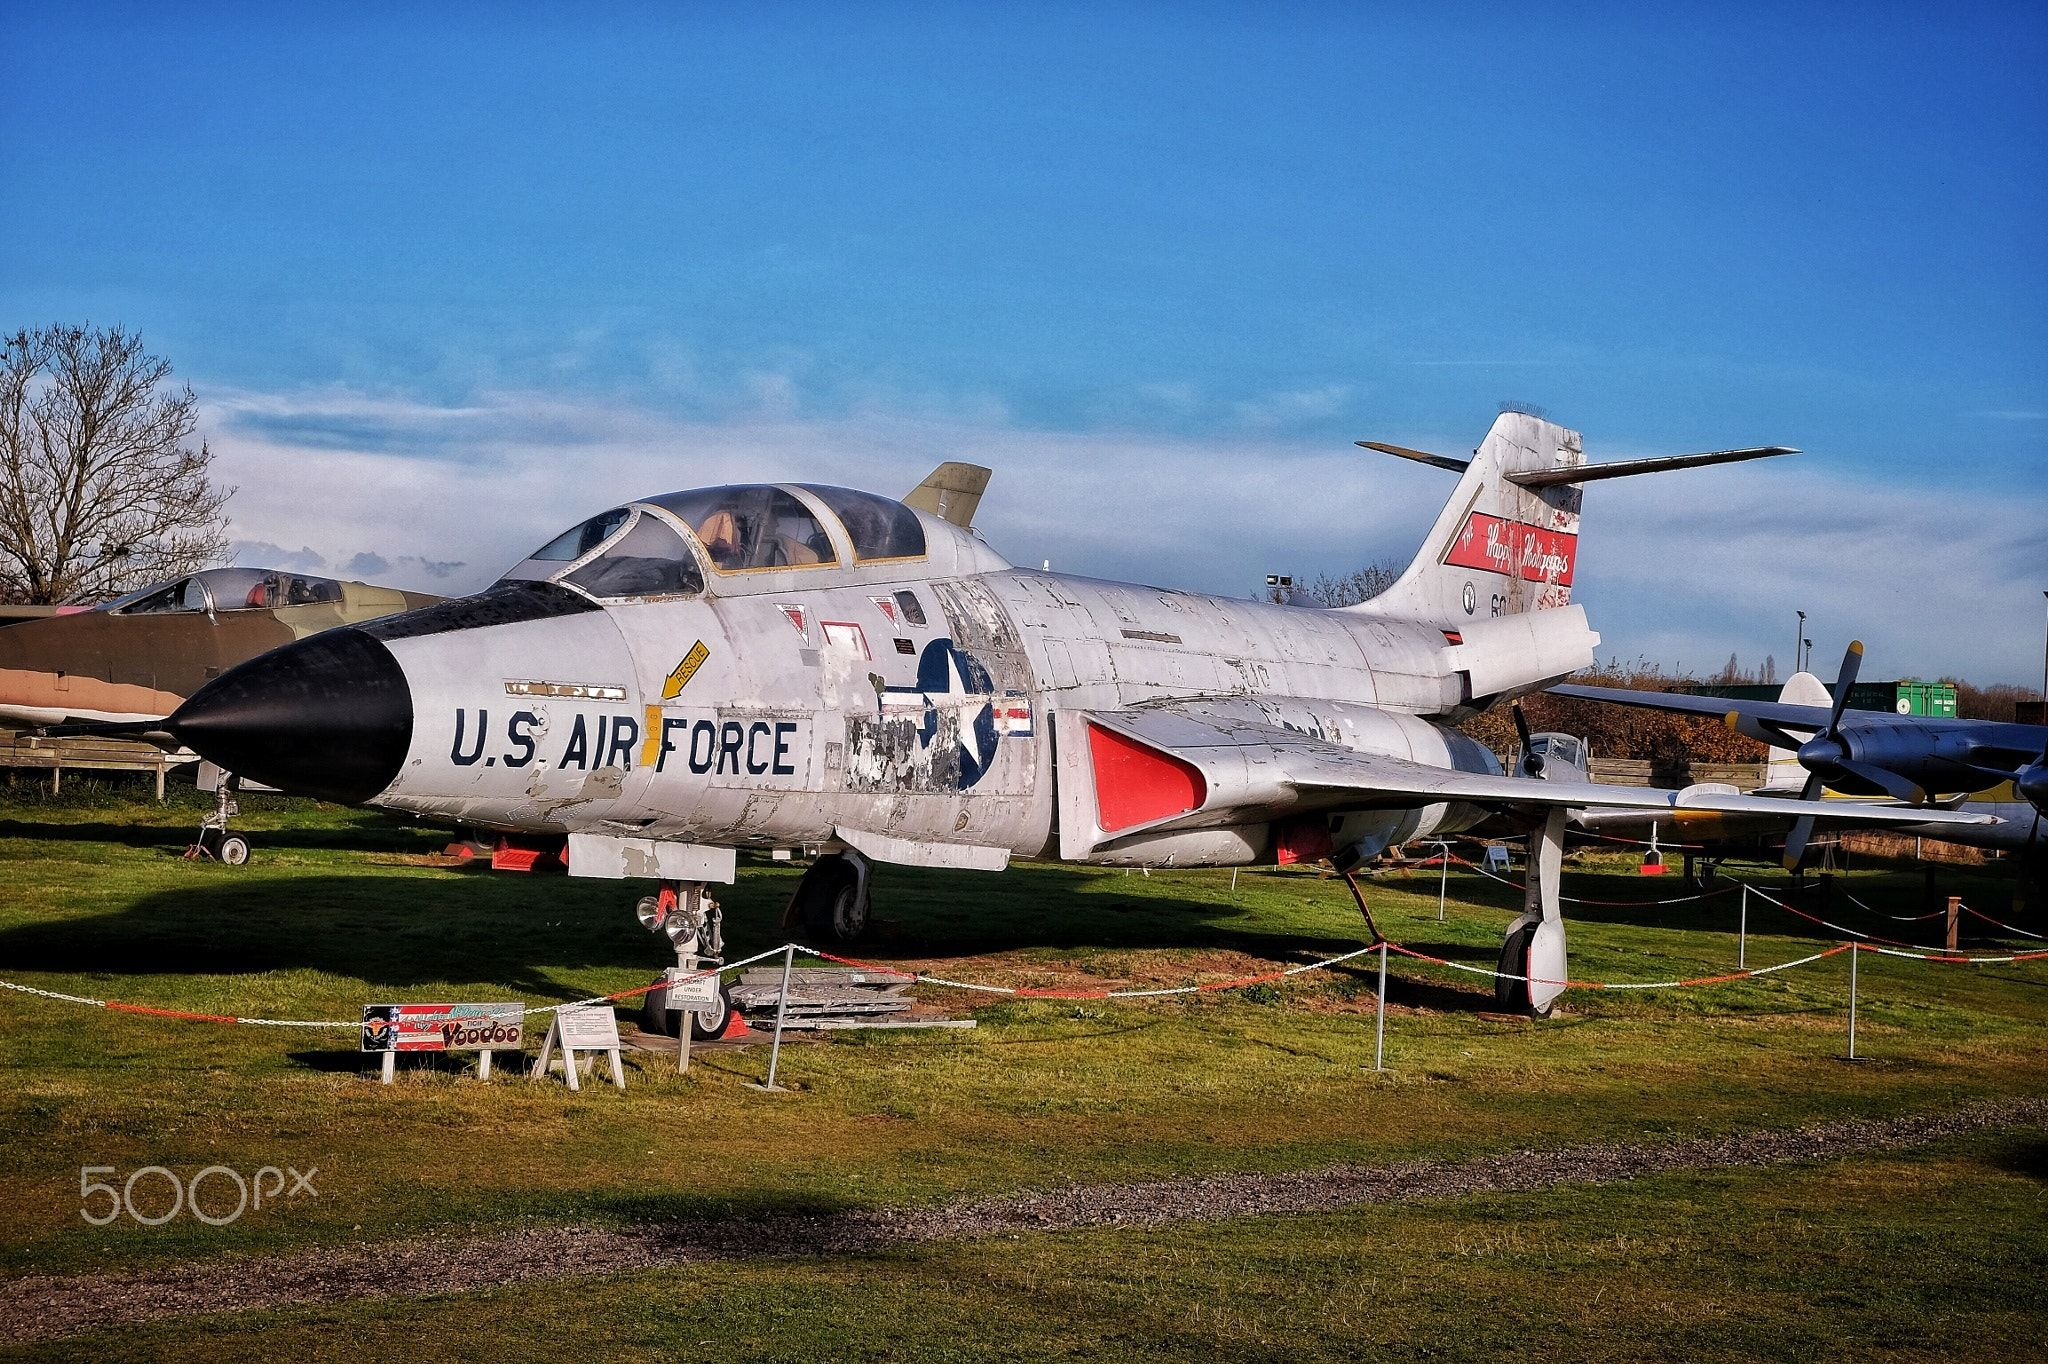 Voodoo F101 McDonnell F101B80MC Voodoo Fighter